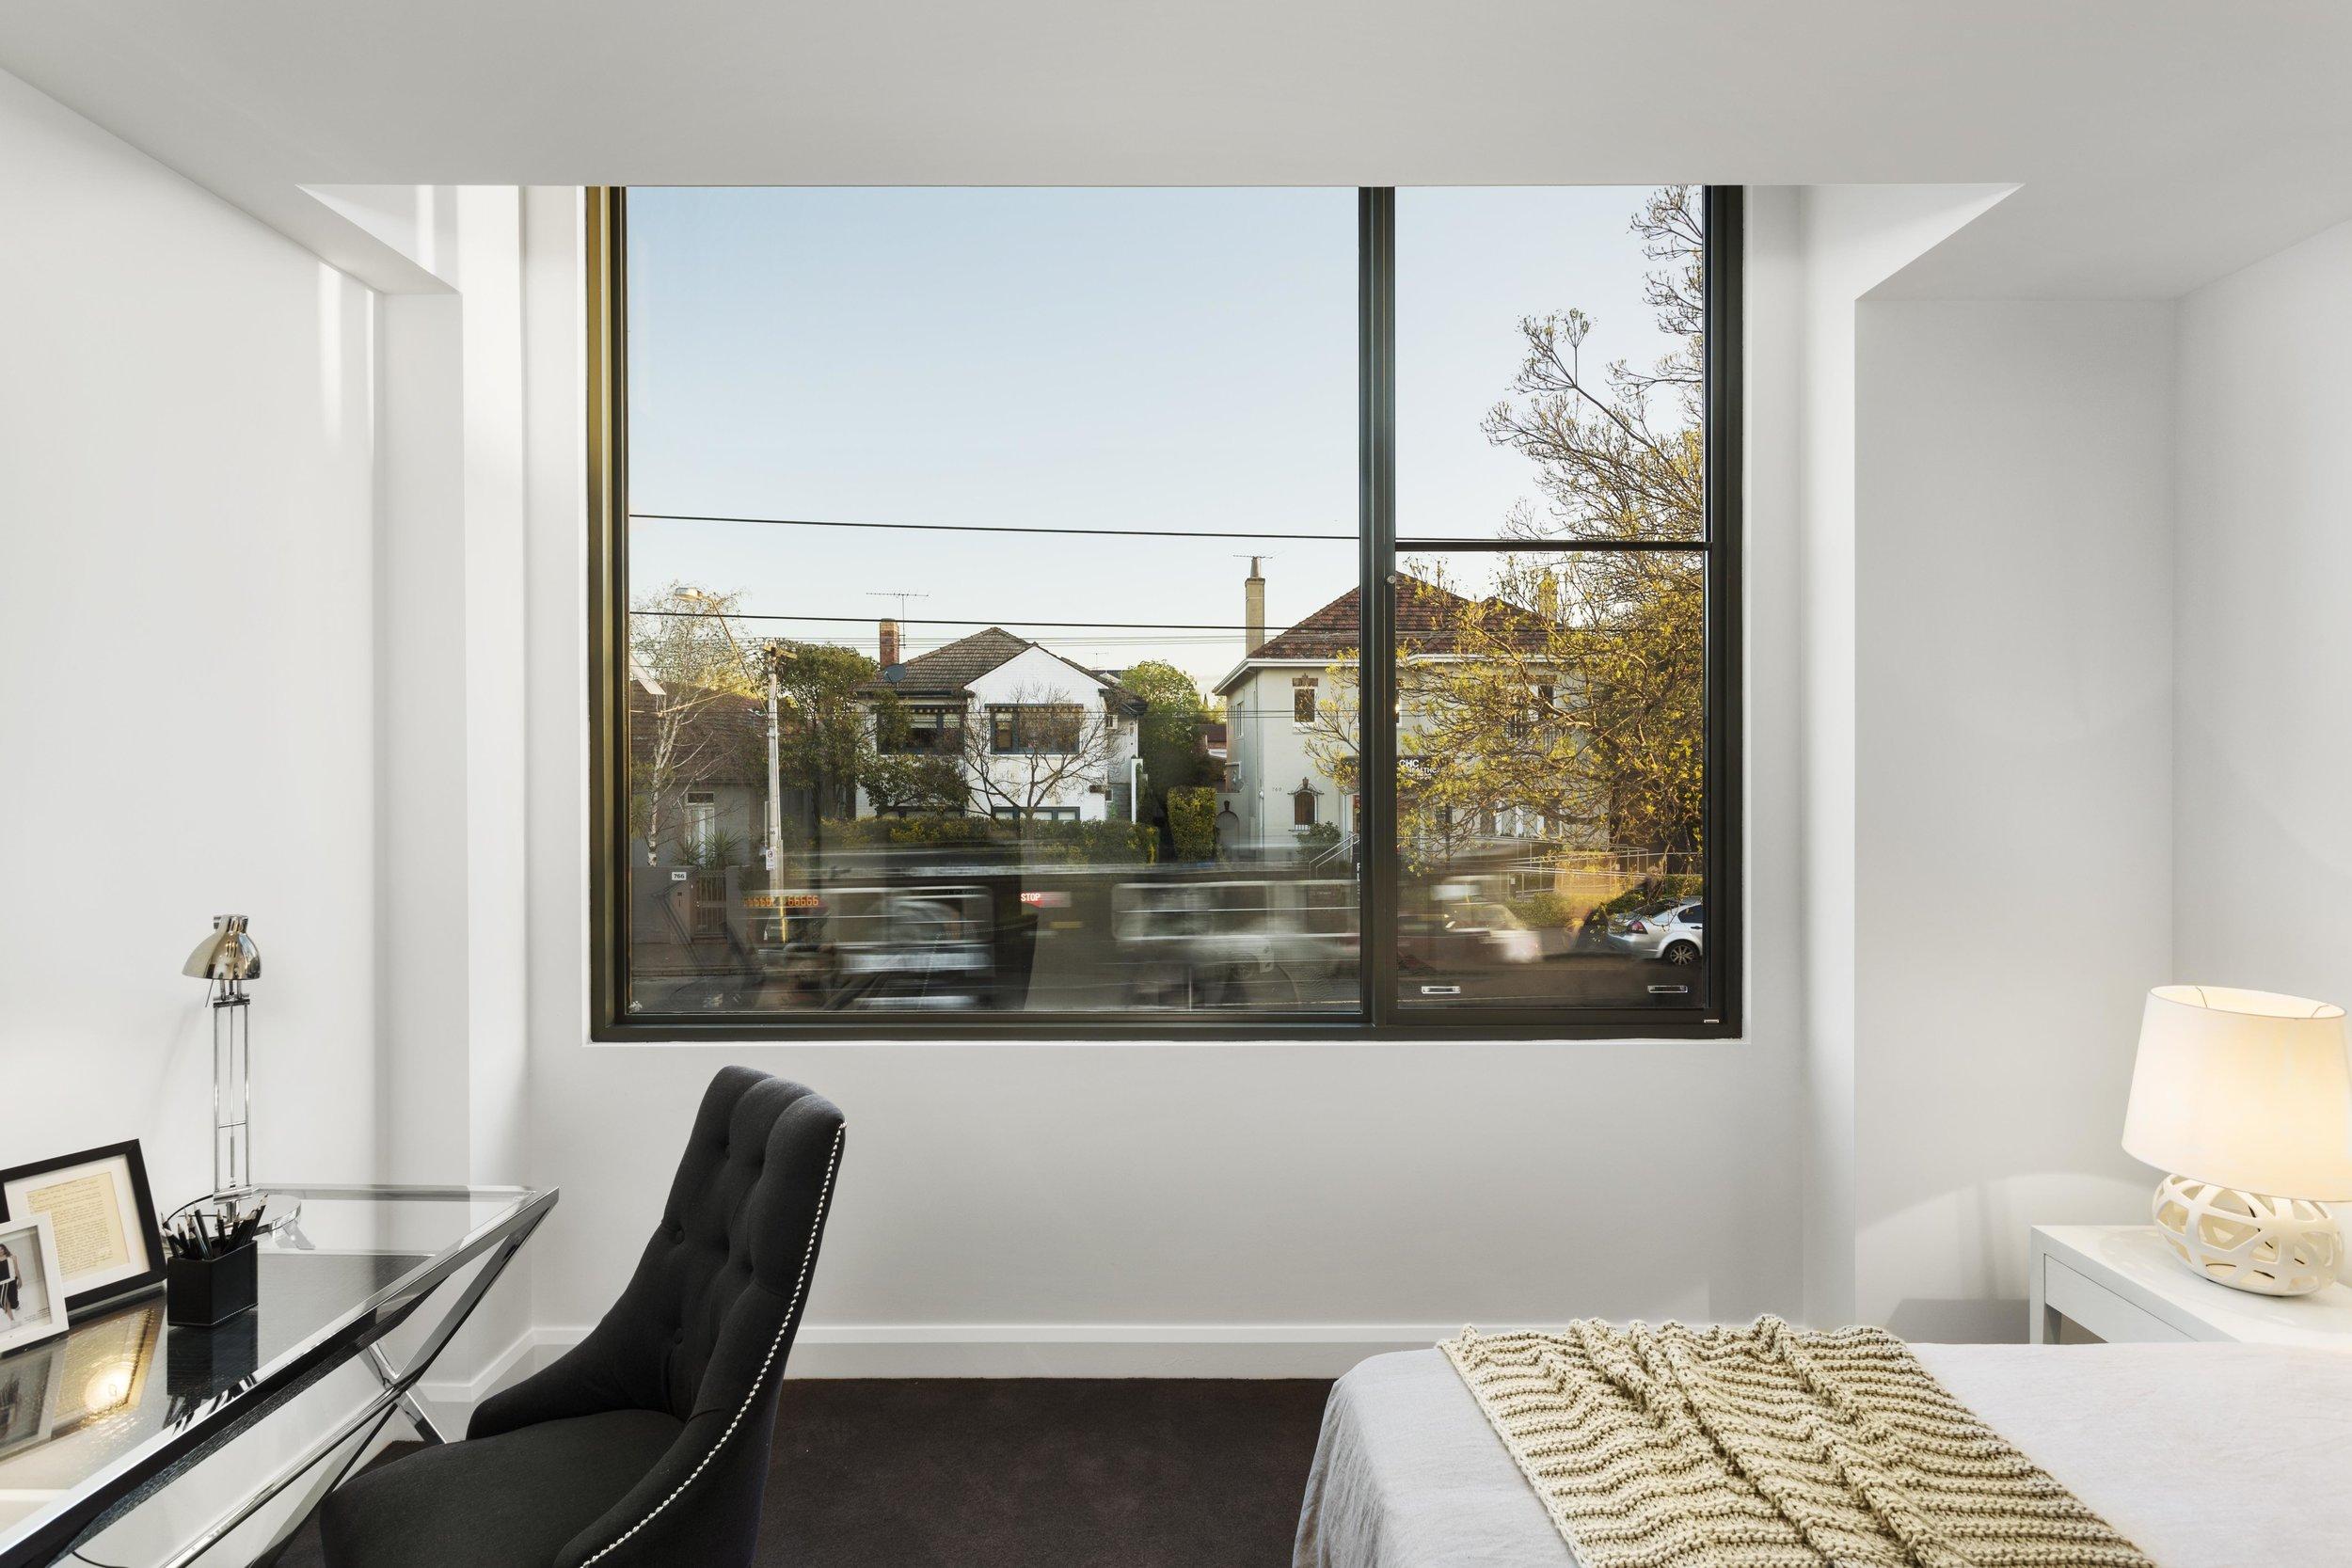 Armadale-Residence-Guymer-Bailey-Architects-07.jpg